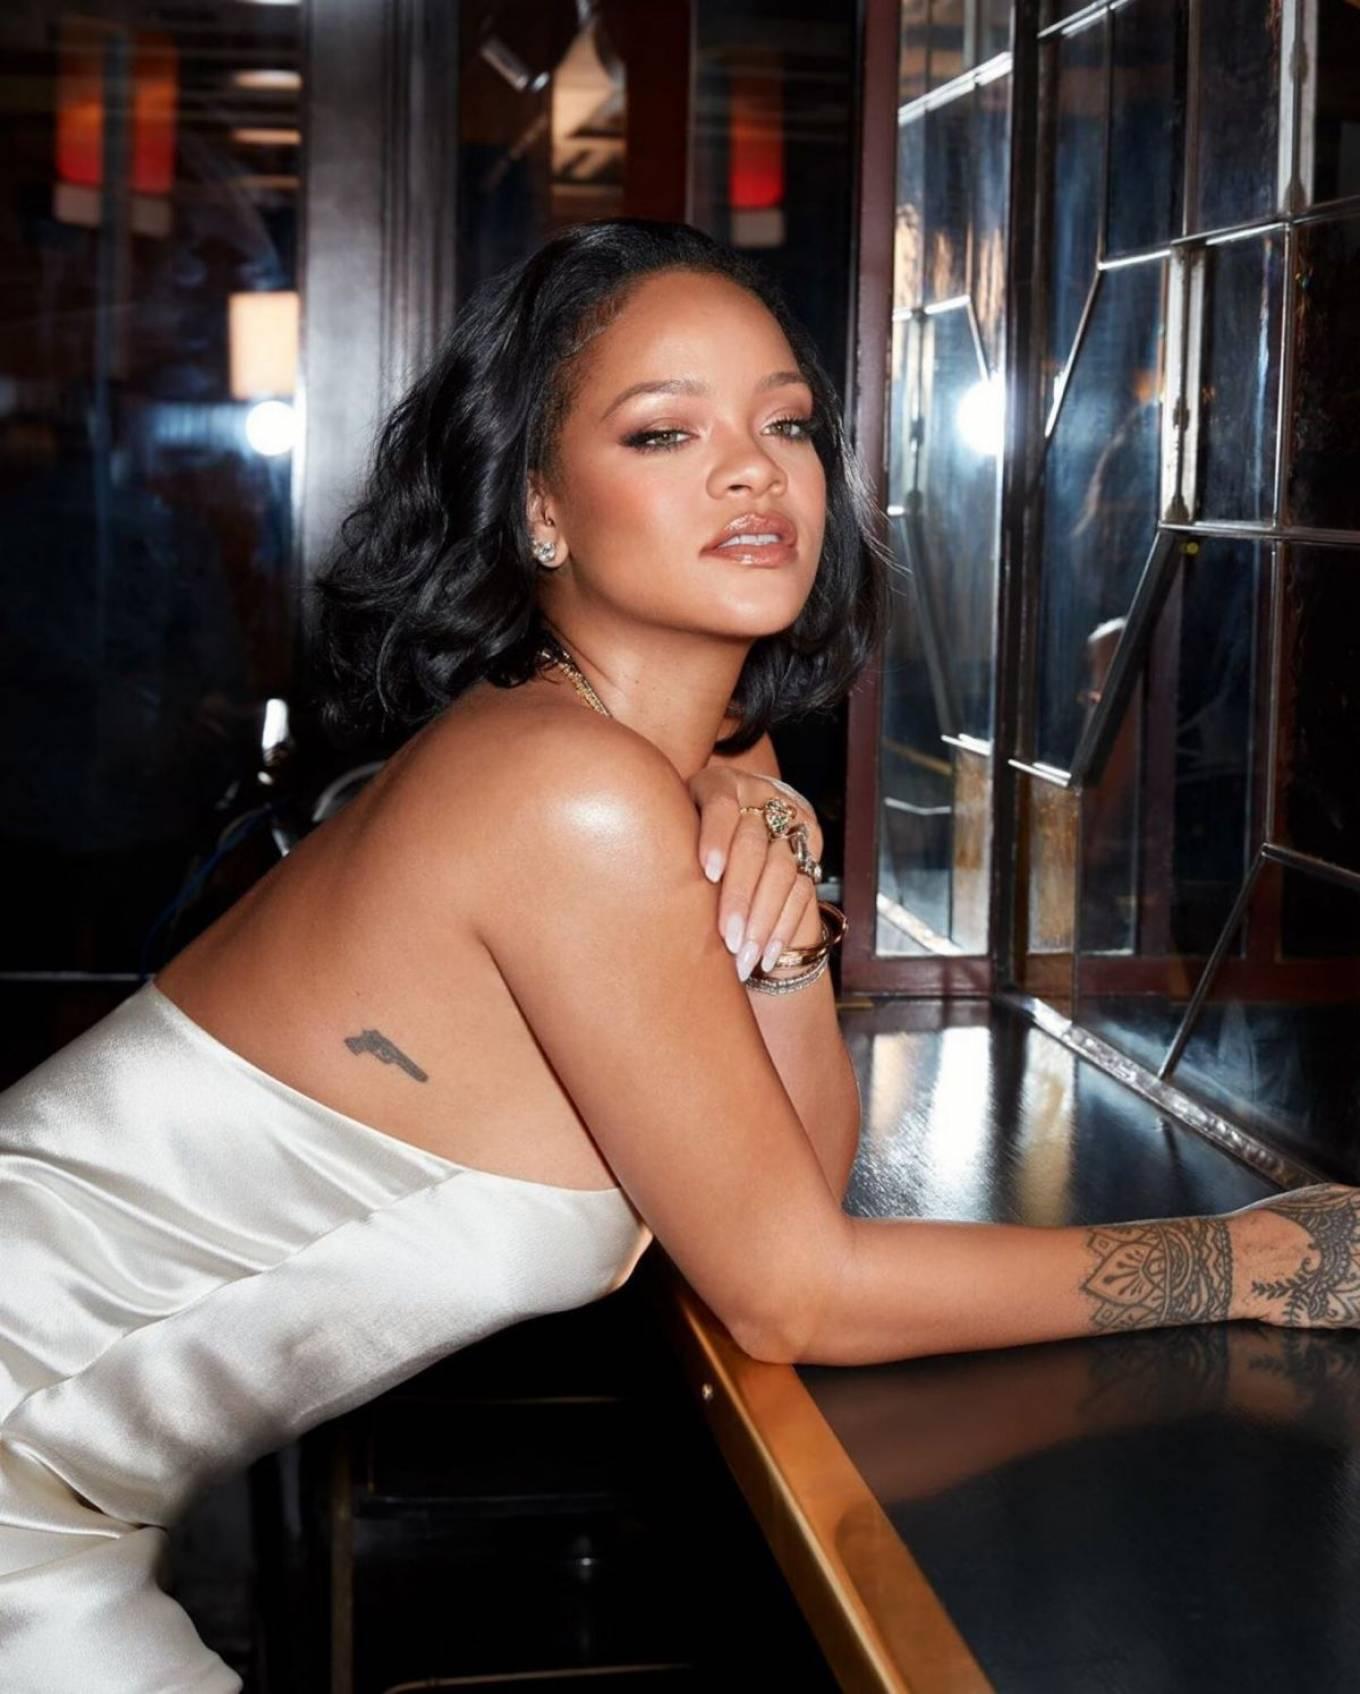 Rihanna - Fenty Beauty Cream Blush and Bronzer 2020